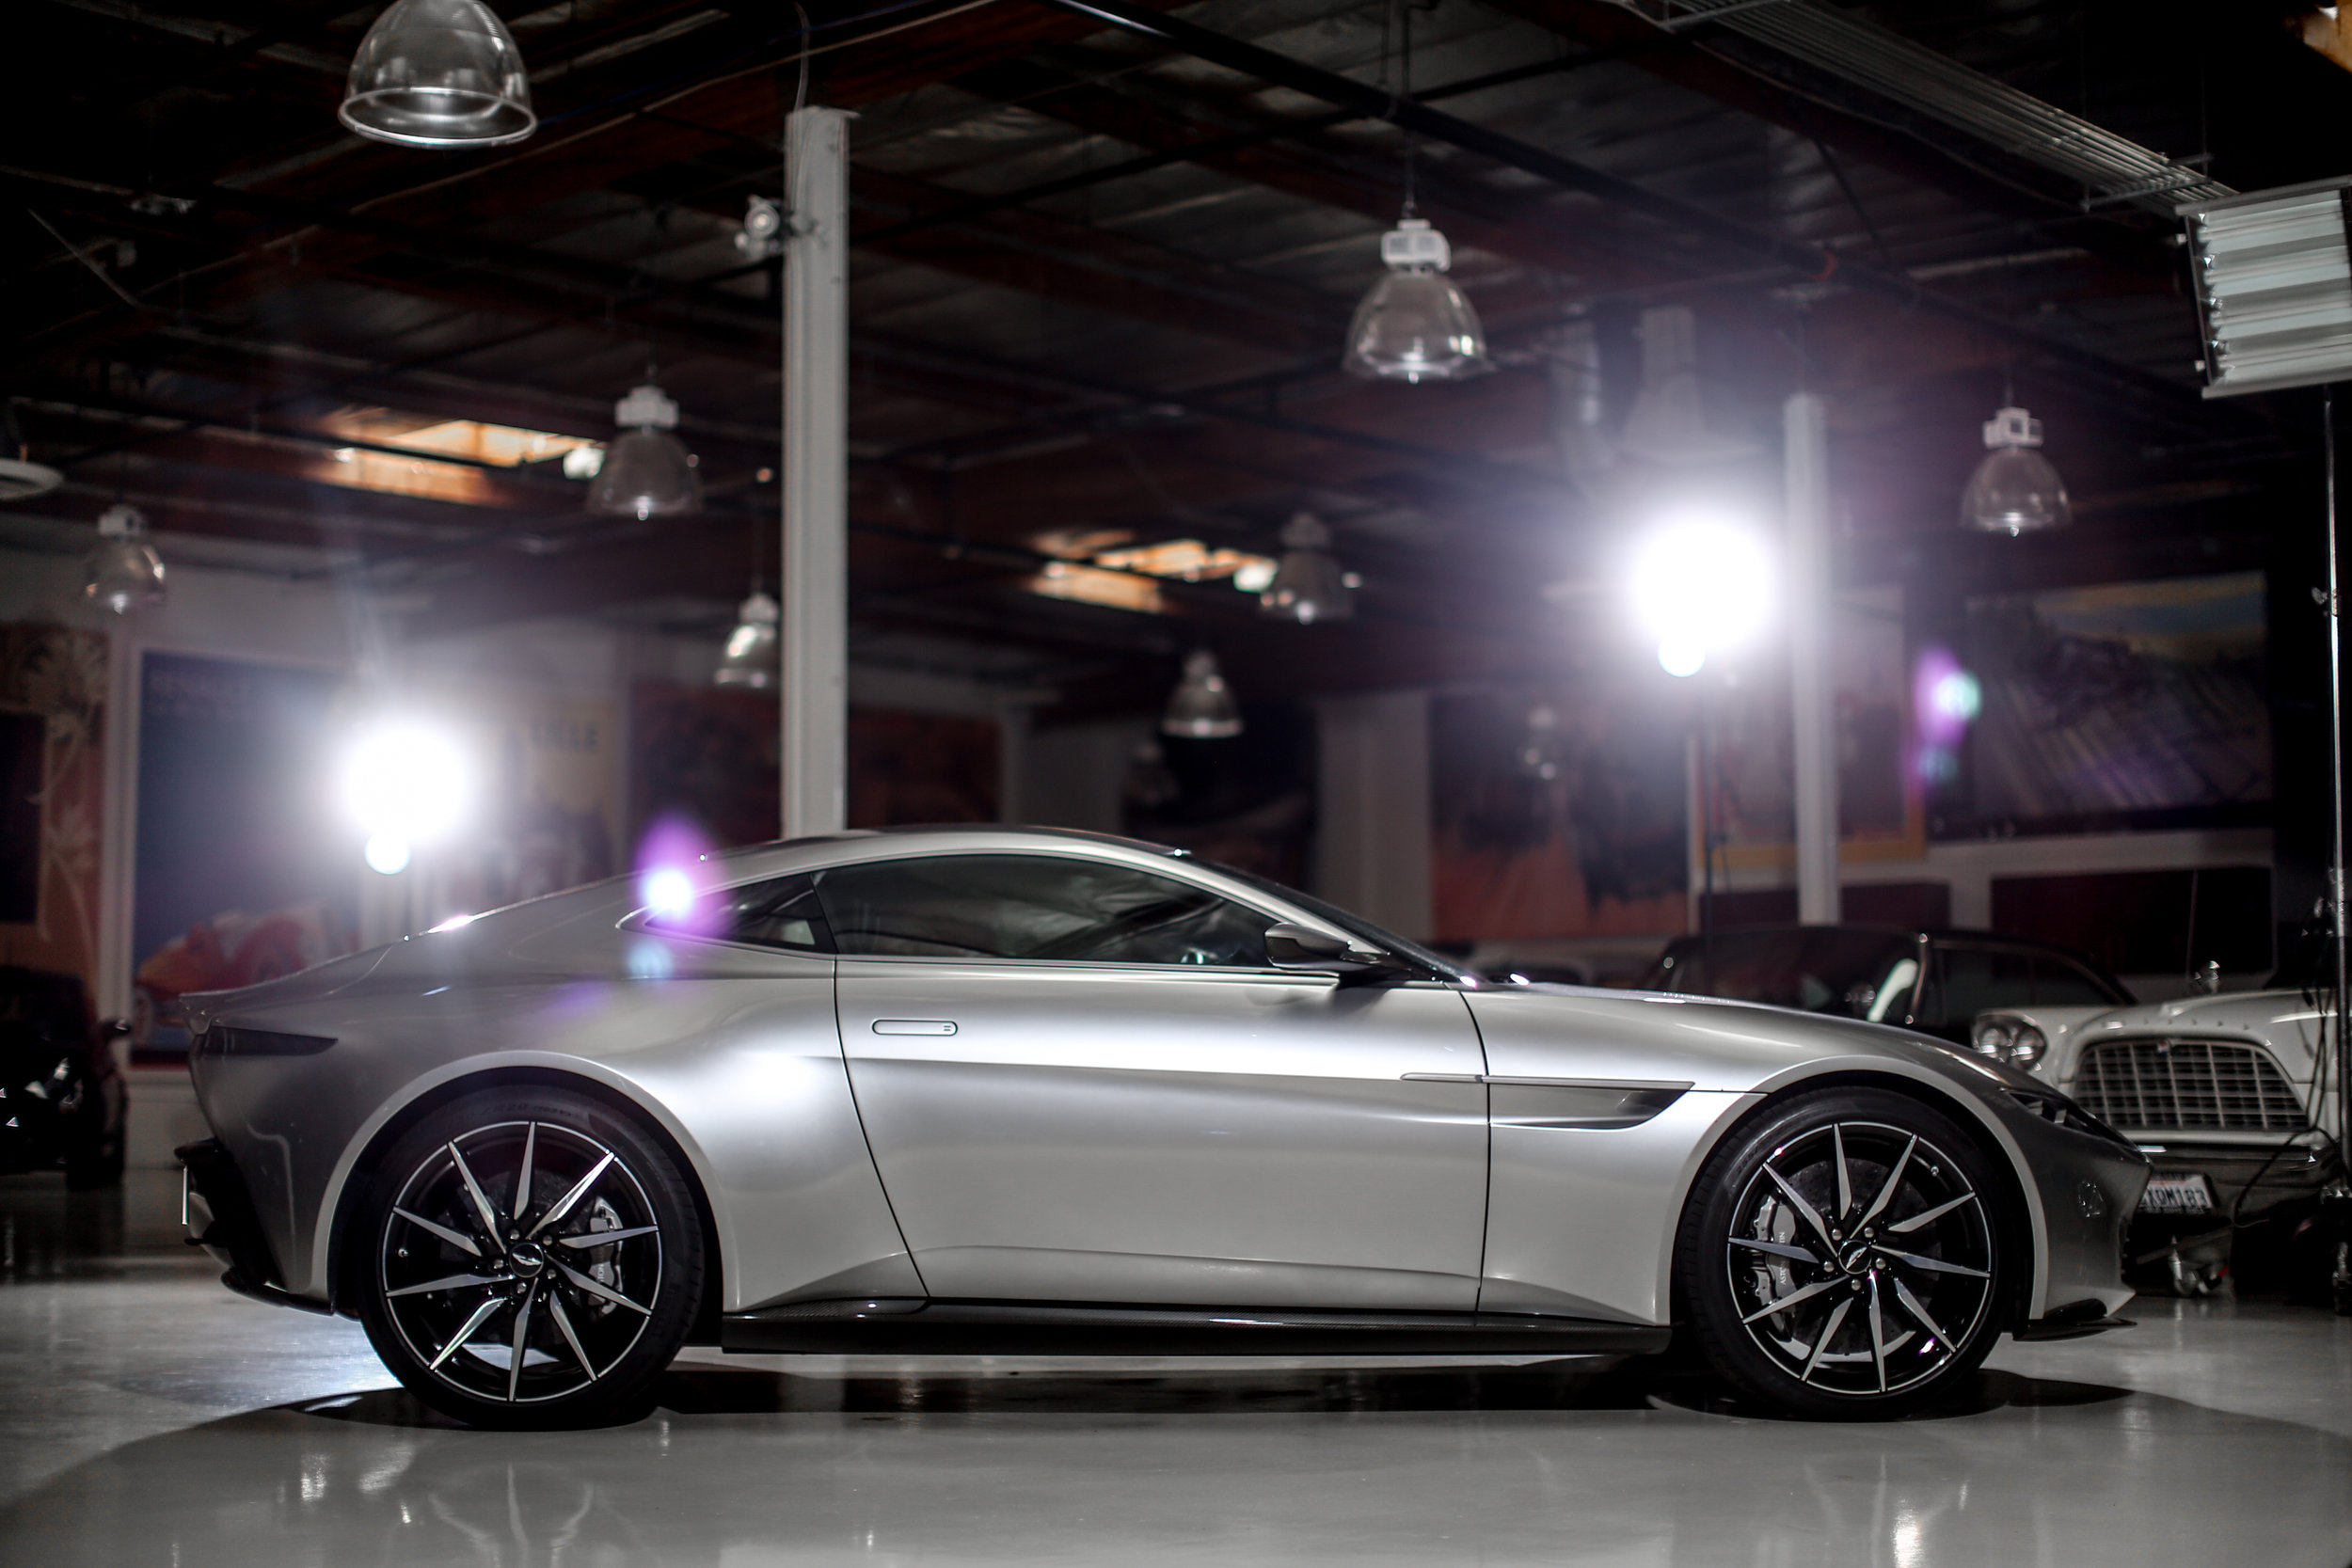 James Bond's 2016 Aston Martin DB10